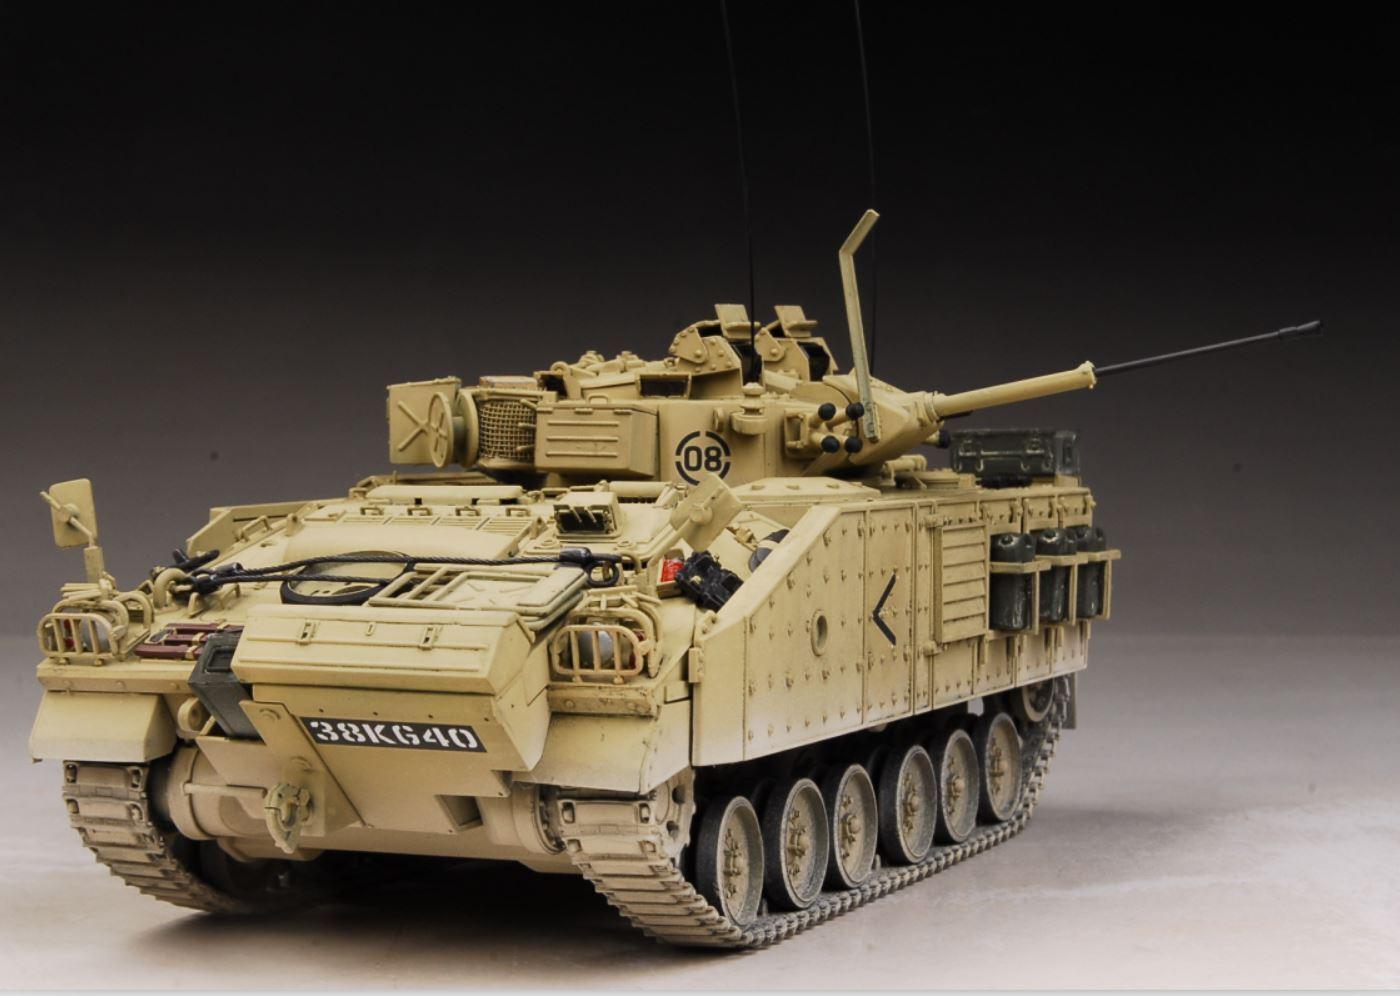 Award Winner Built 1 35 British Warrior Infantry Fighting Vehicle +Detail+ACC